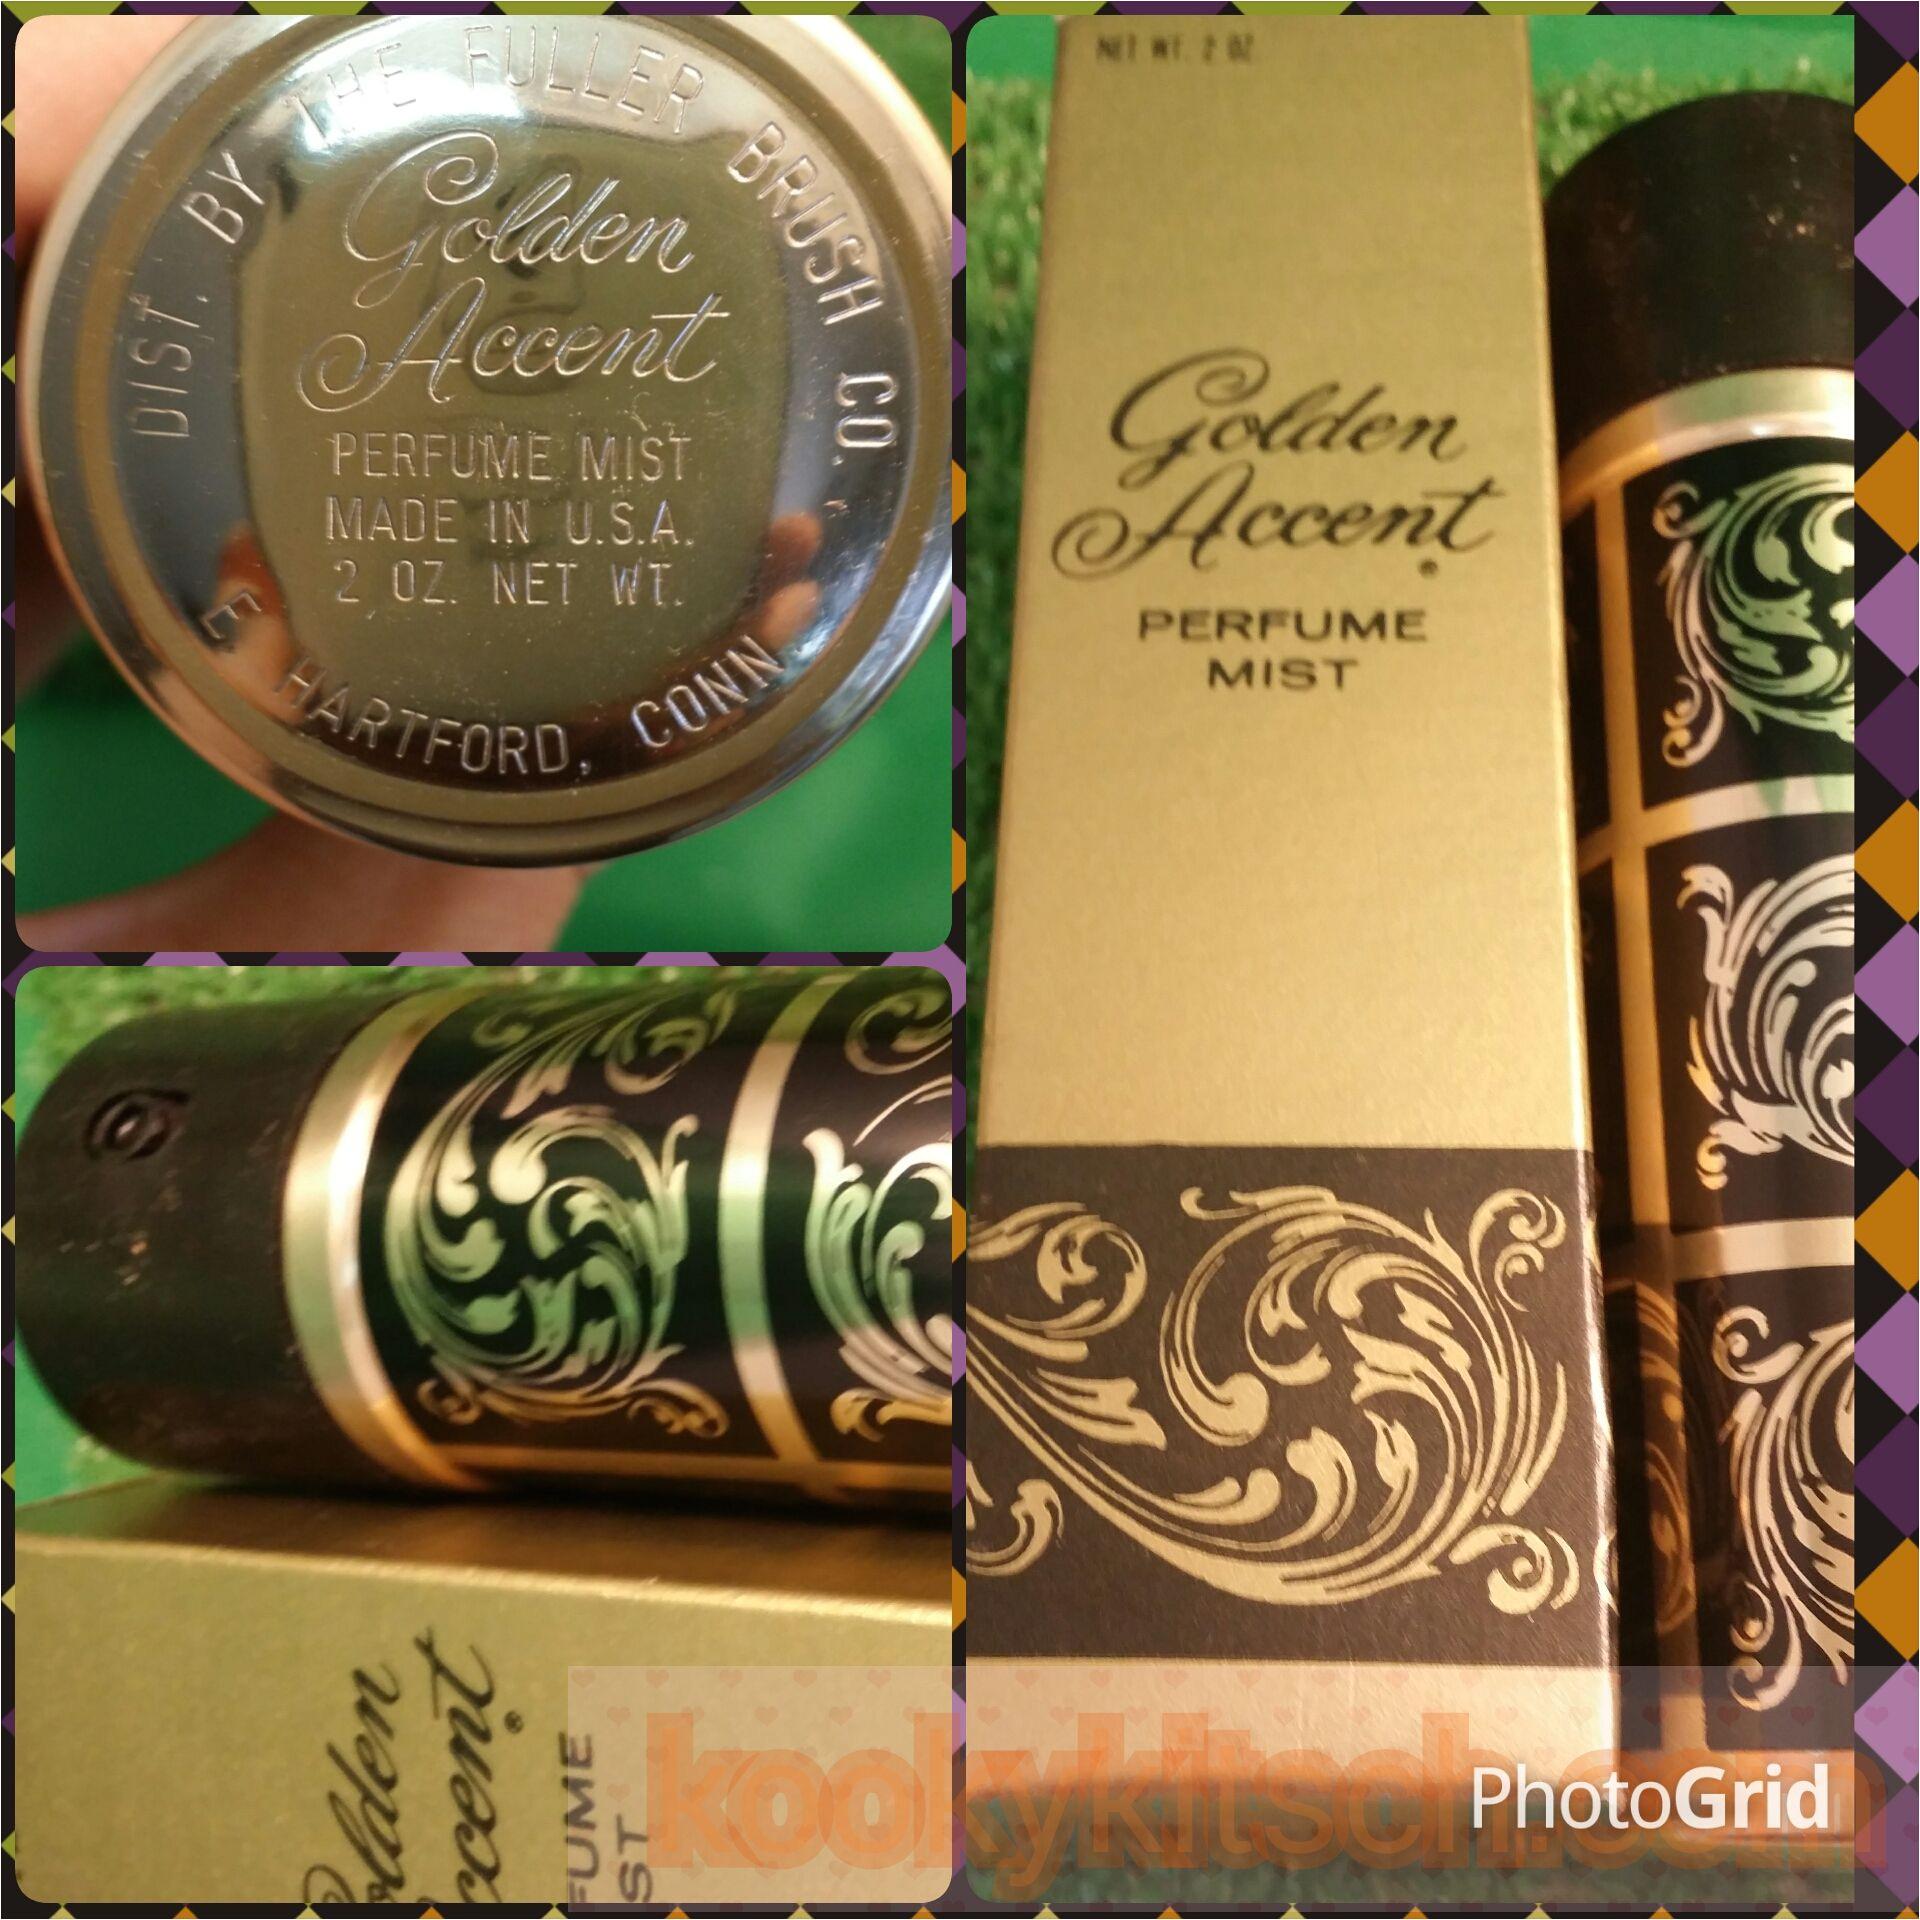 vintage fuller brush golden accent perfume mist bottle and box 2 oz